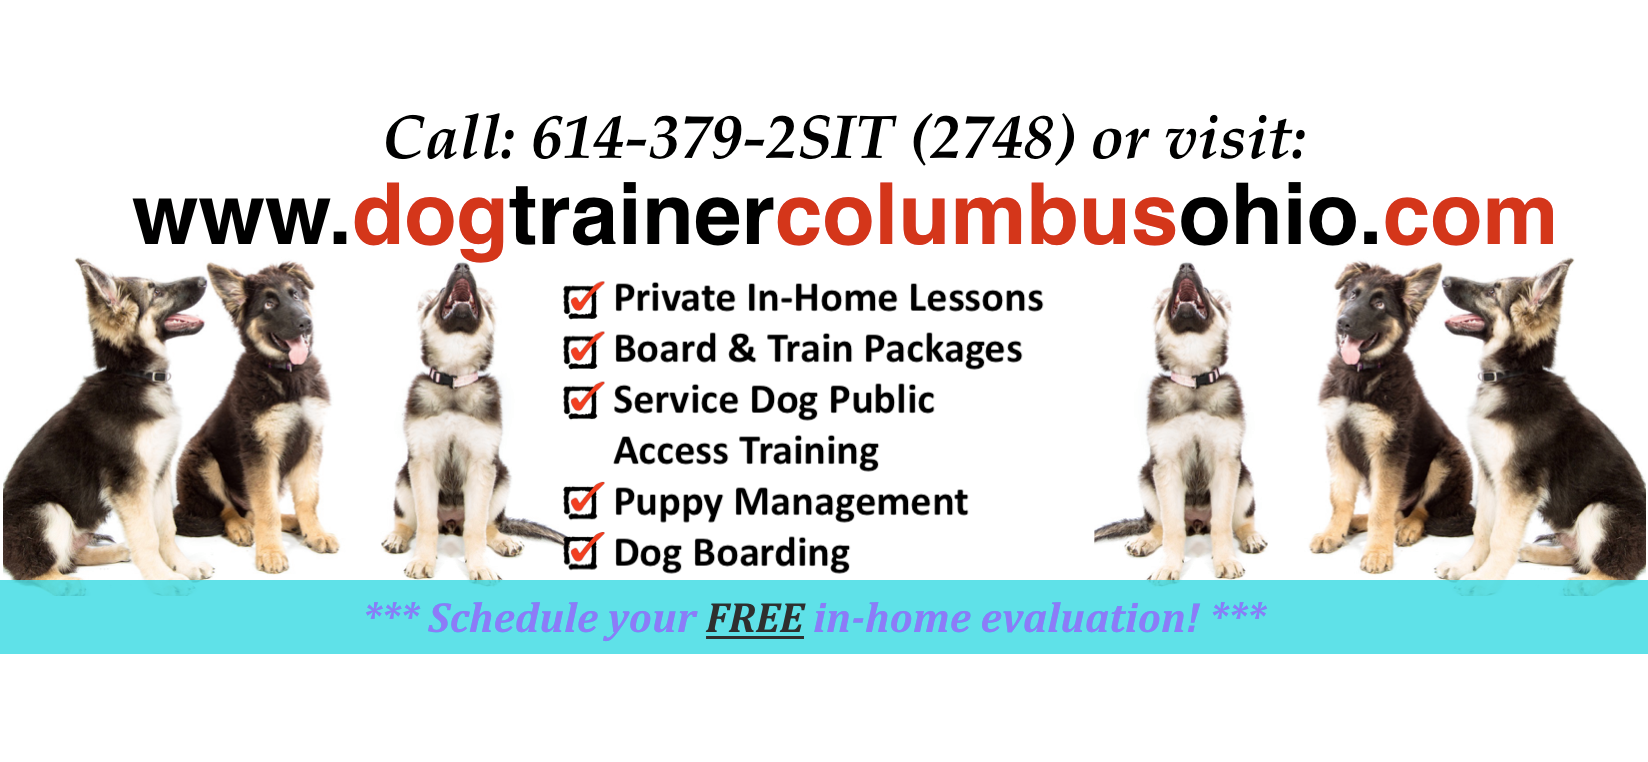 Dog Training Columbus Ohio Provides World Class Dog Obedience And Dog Behaviour Training Throughout Columbus New Alba Dog Training Obedience Dog Training Dogs